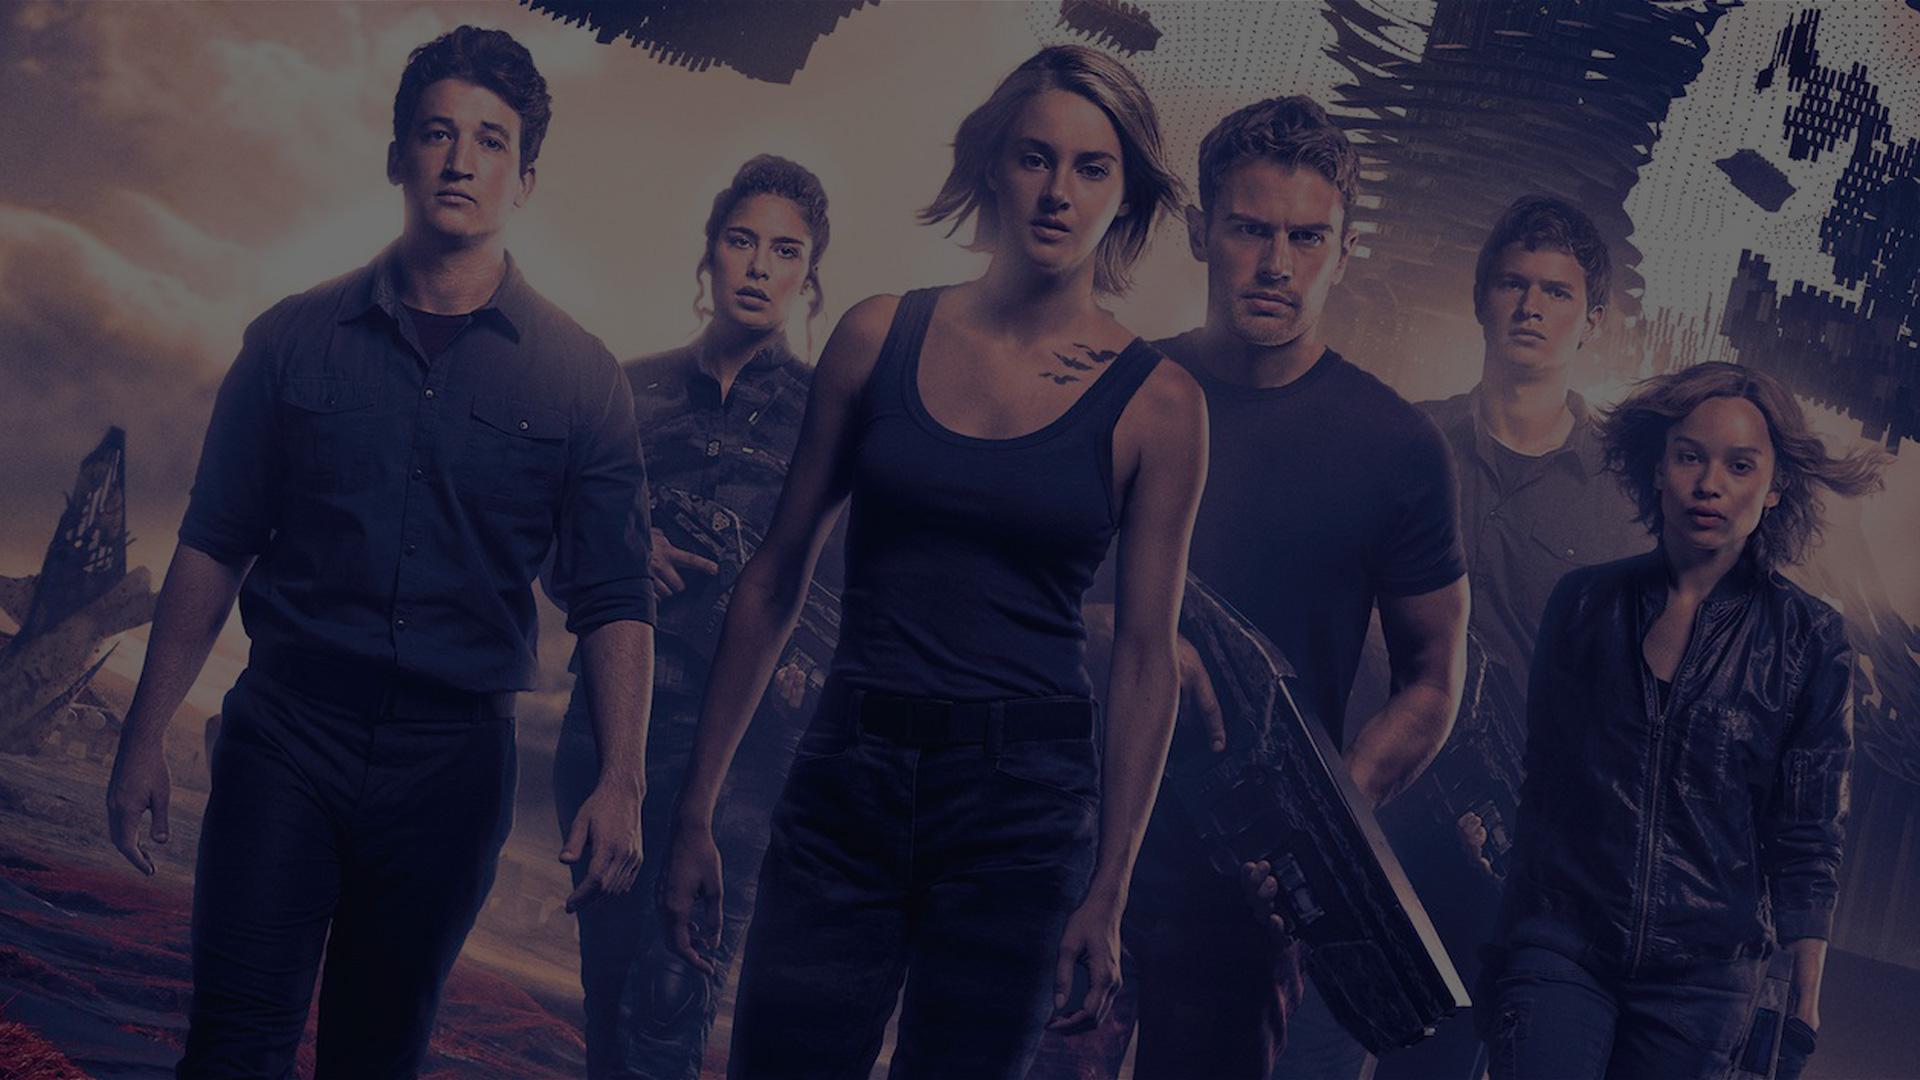 The Divergent Series | Shailene Woodley, Theo James, Ansel Elgort, Zoe Kravitz, Miles Teller, Kate Winslet | Lionsgate